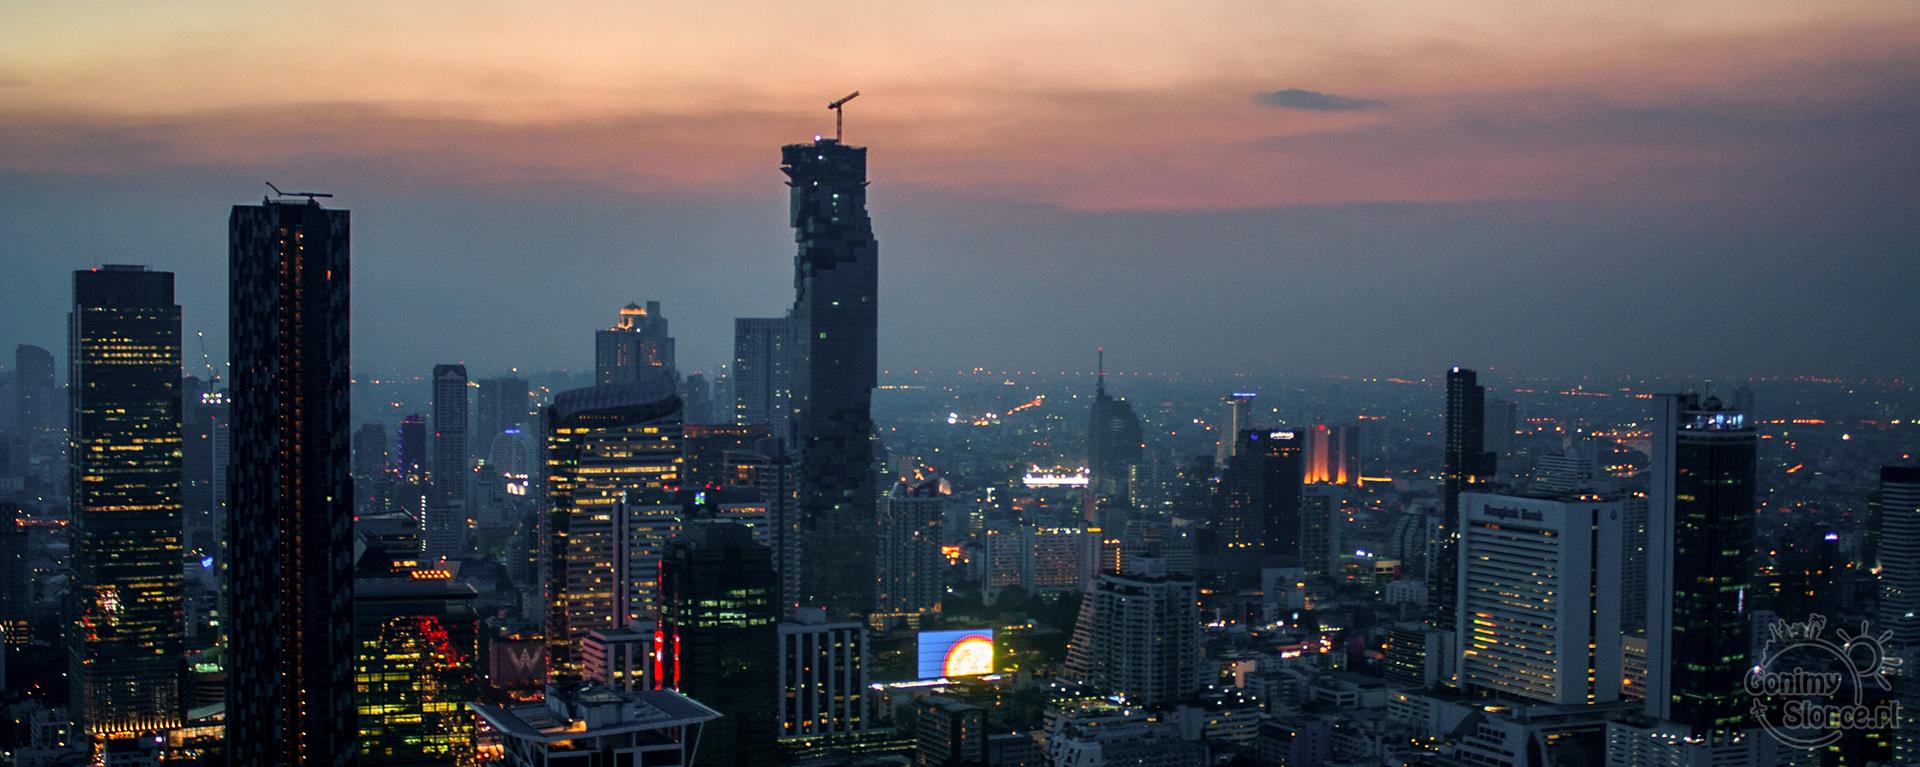 Sky Bar w Bangkoku, drapacze chmur